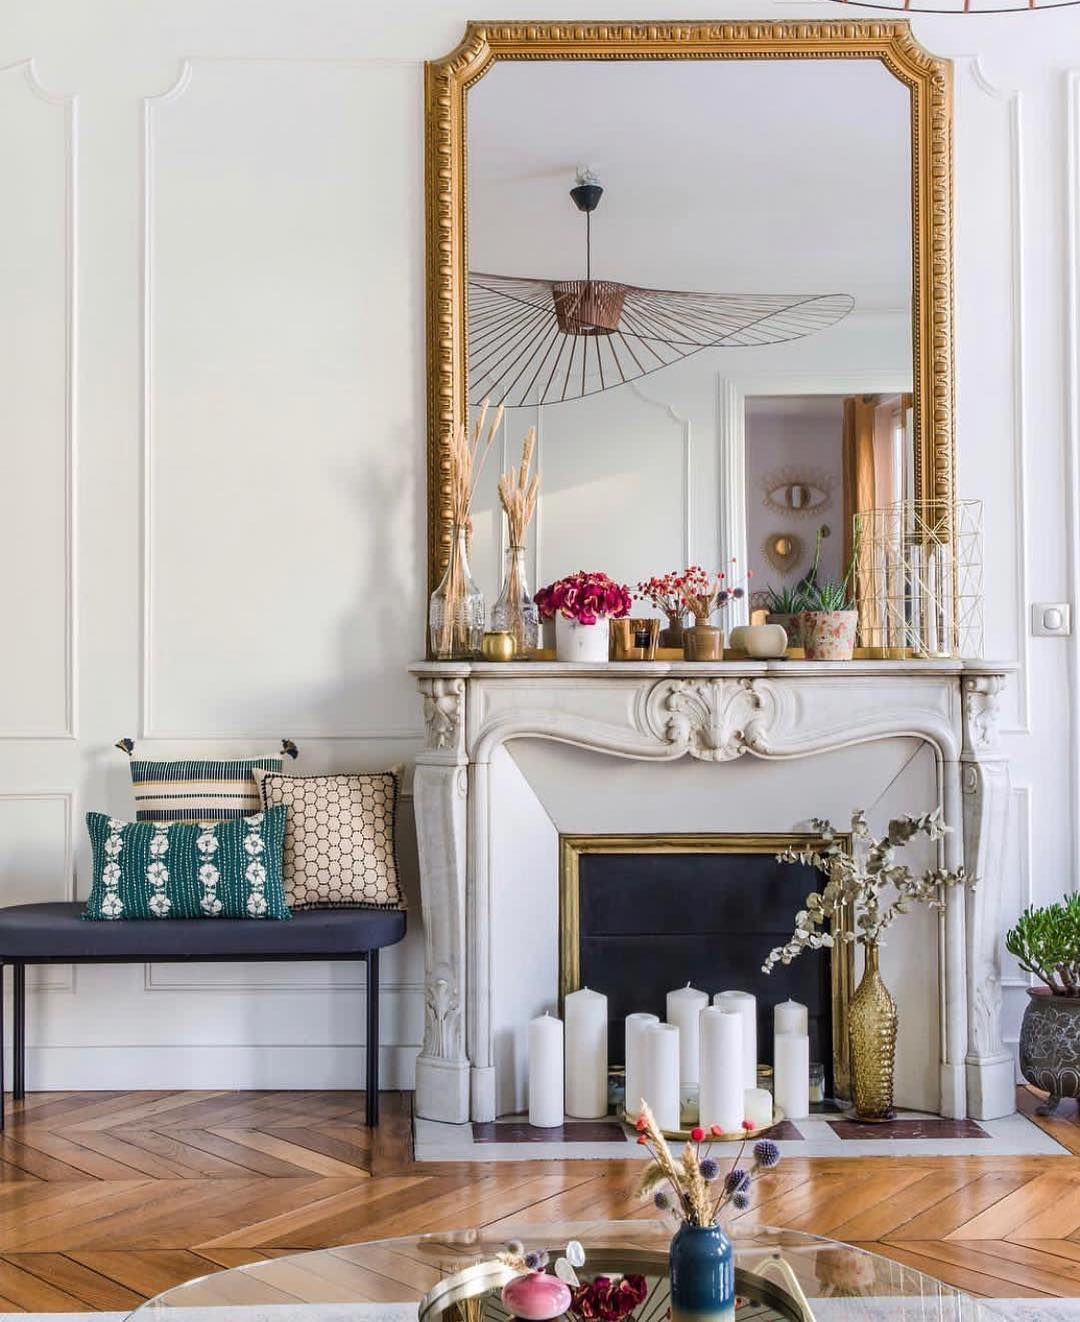 "Darya Kopp on Instagram: ""@jaminidesign at home 🌸🙌🏻🌻 #livingroomdecor #appartementparisien #haussmannien #passiondeco #colors #homesweethome #parisienne"""